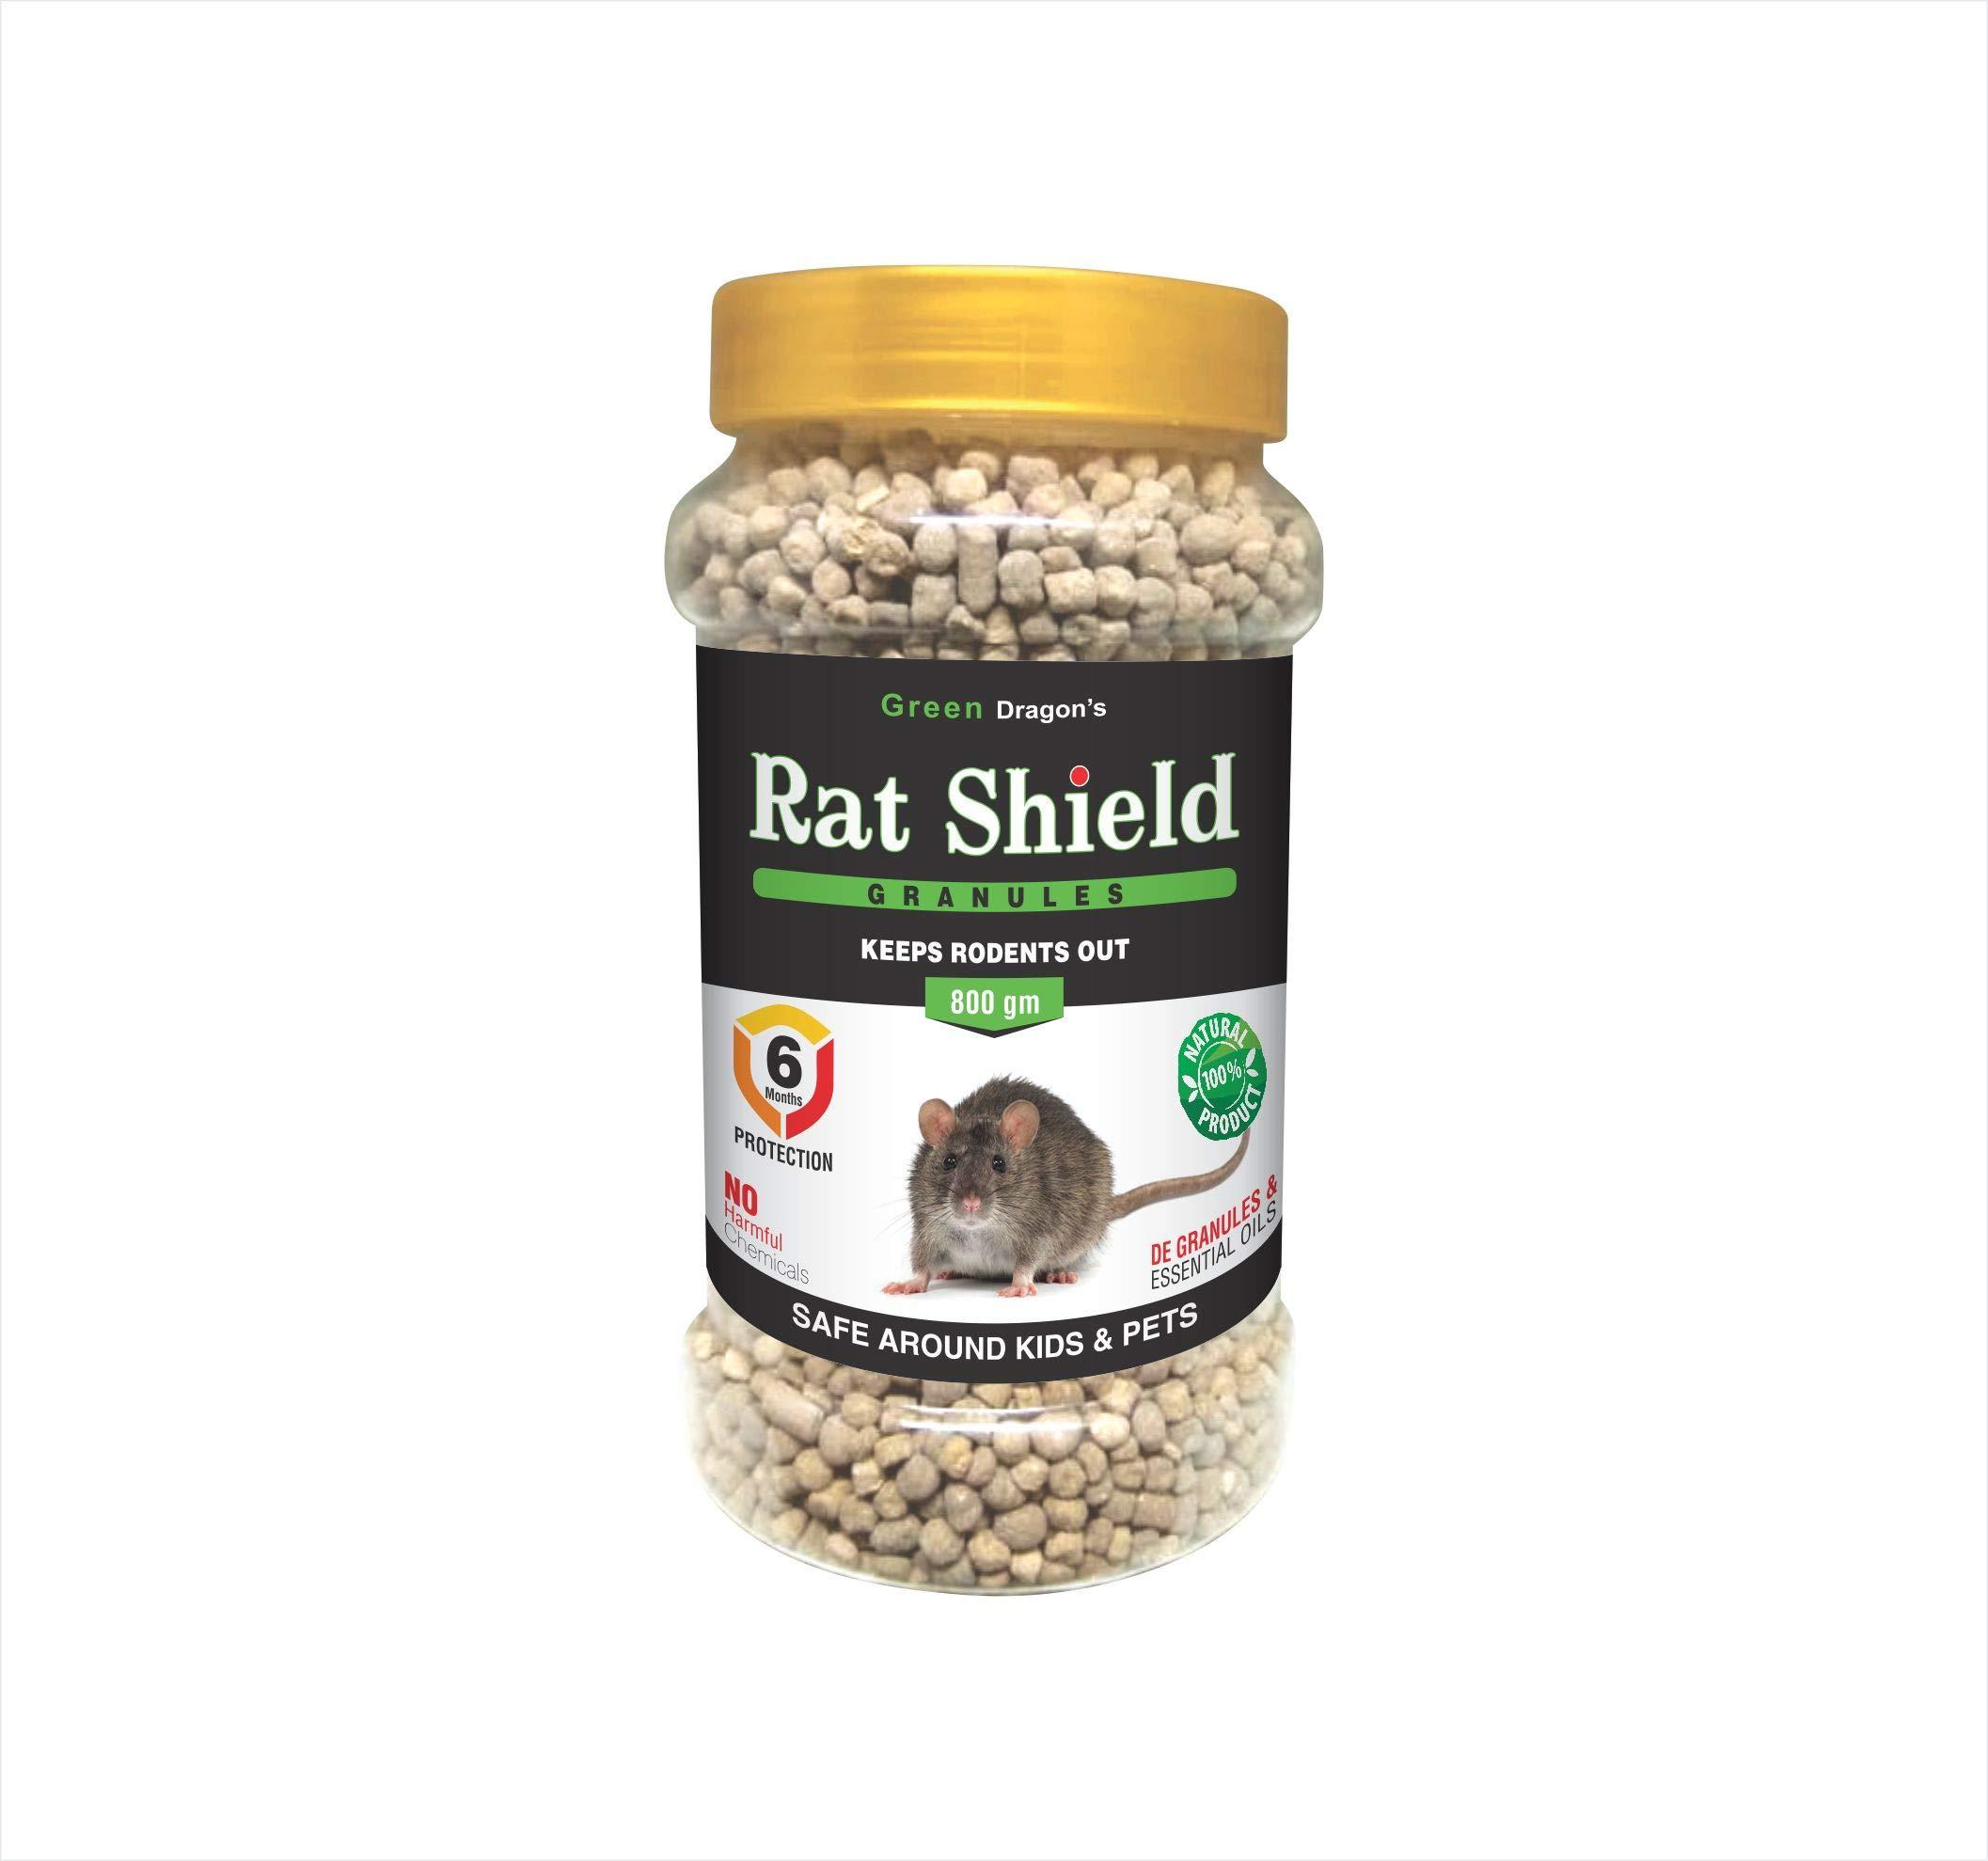 Green Dragon's Rat Shield Granules - 800 gm